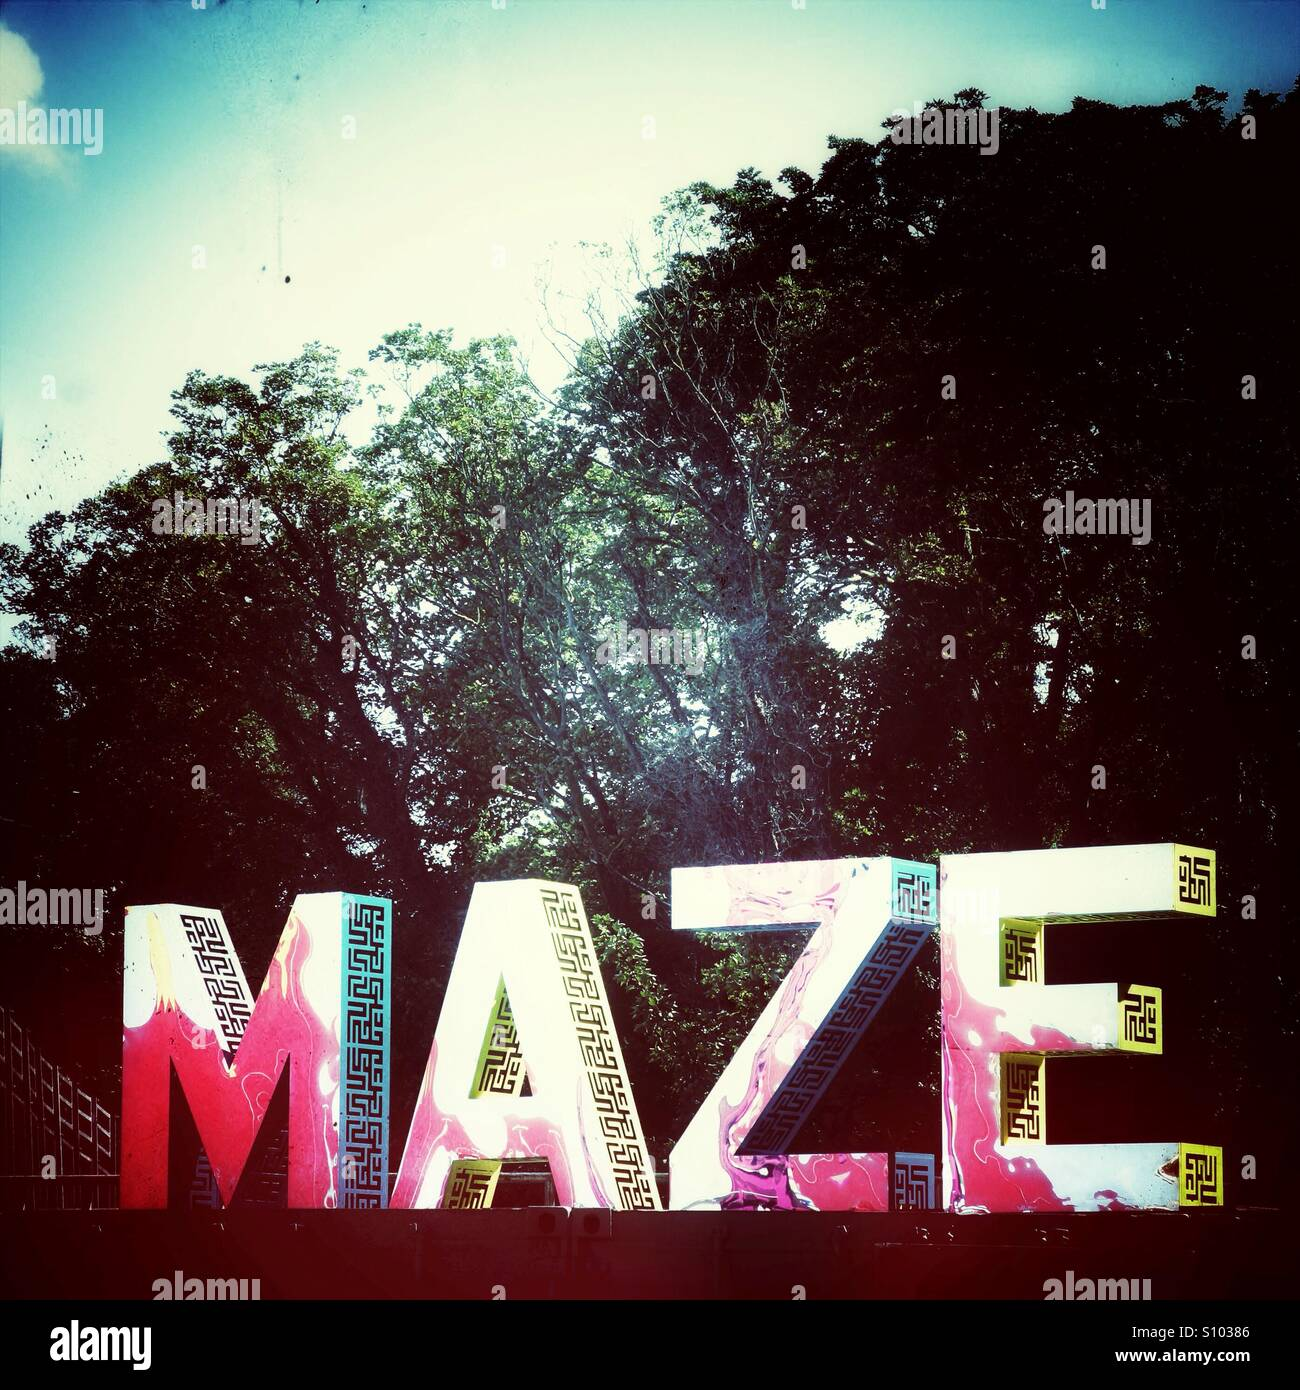 Maze sign drealand margate - Stock Image